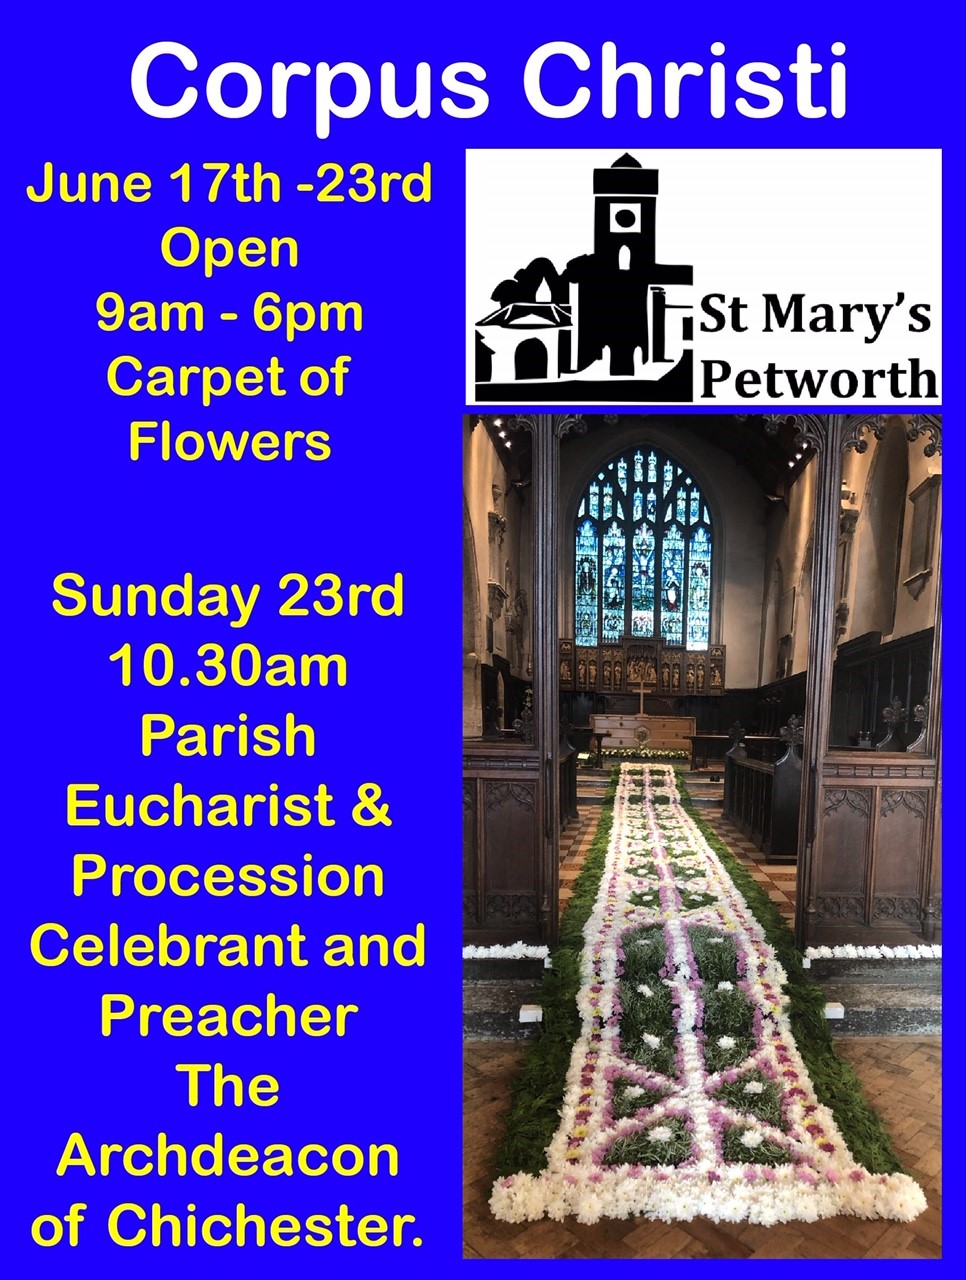 Corpus Christi Final.jpgCorpus Christi Carpet of Flower at St Mary's Church